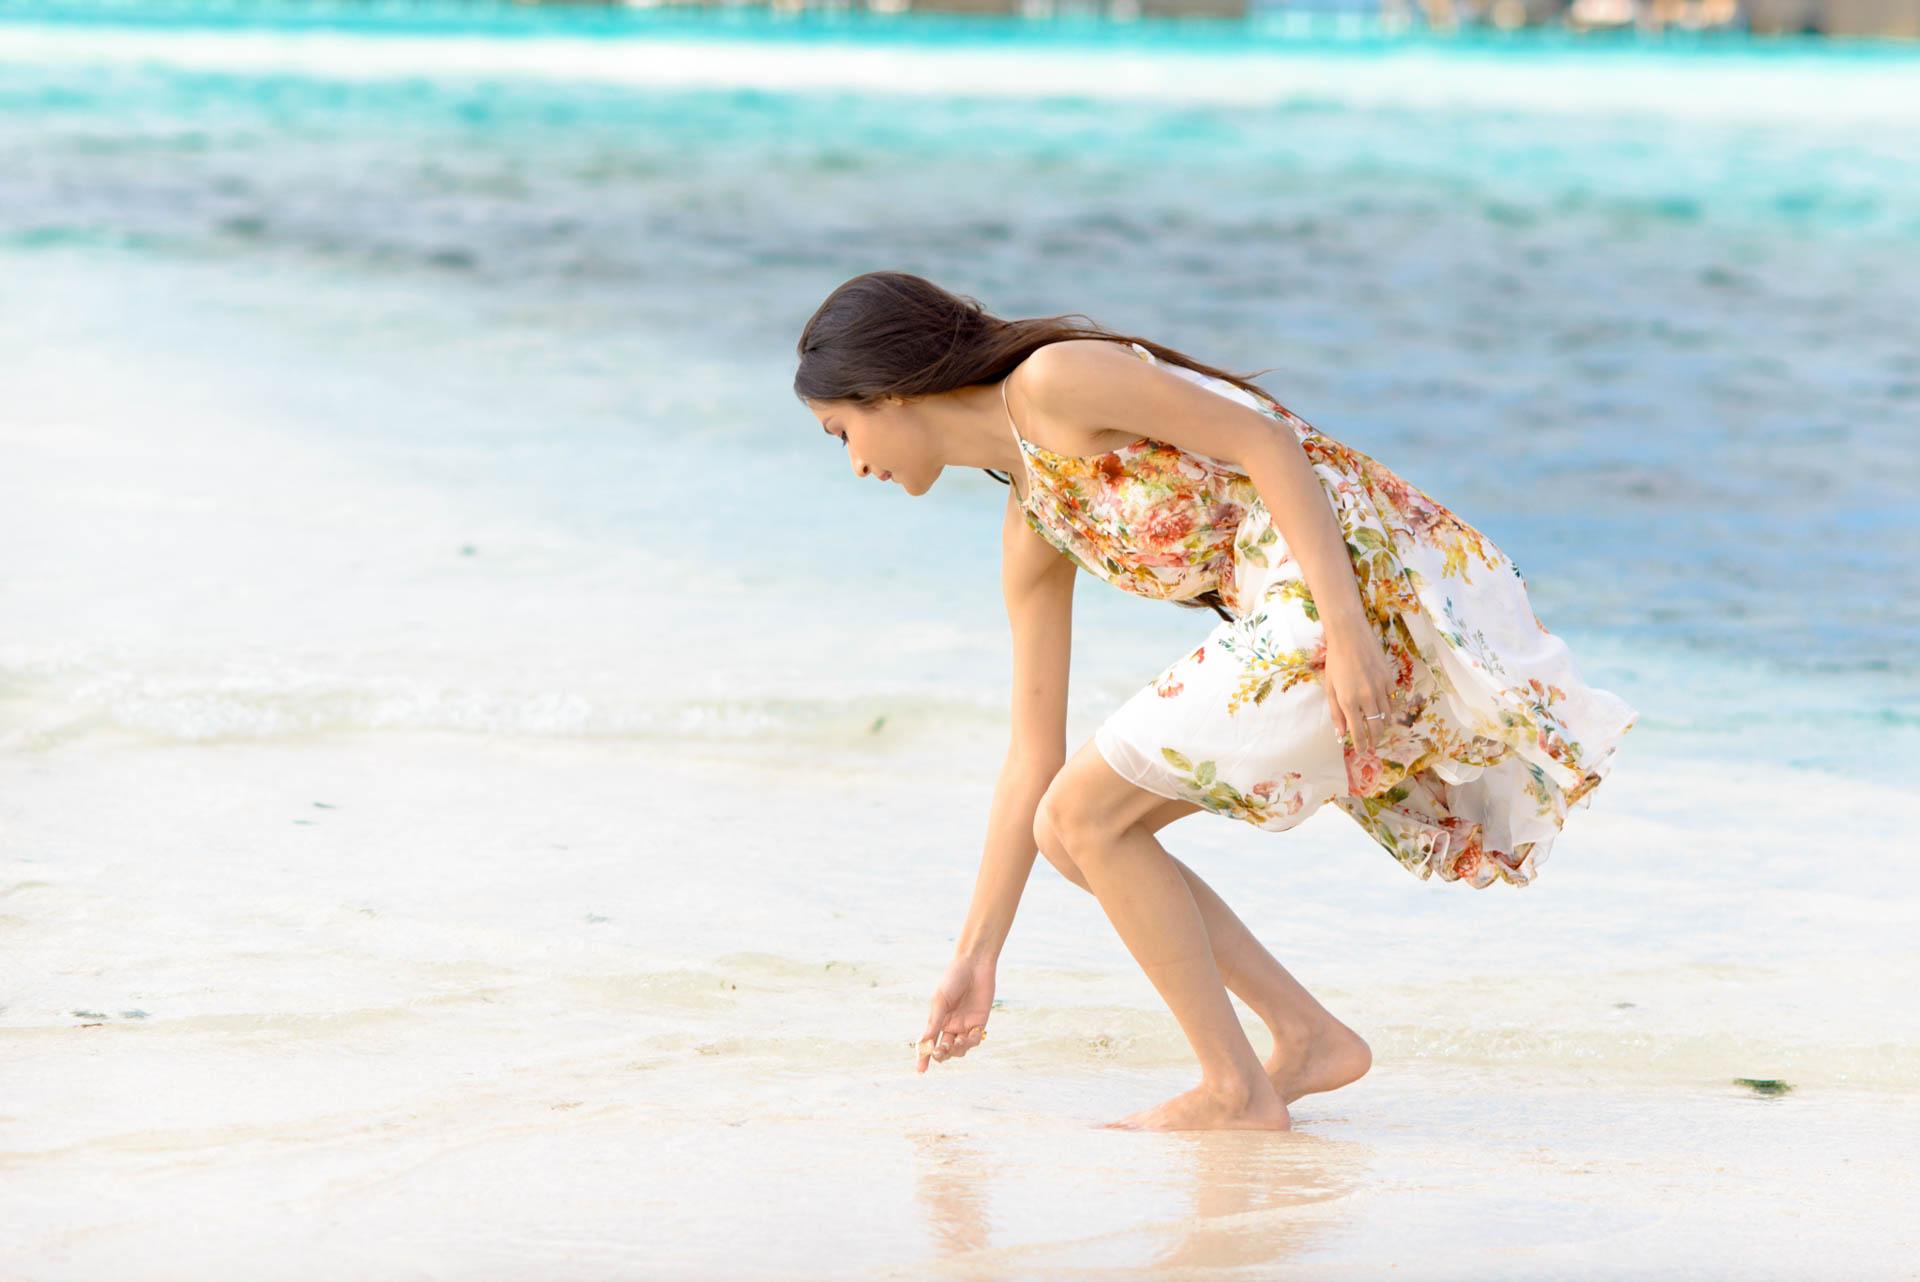 Abhijit Meghna Romantic Vacation in Maldives 20